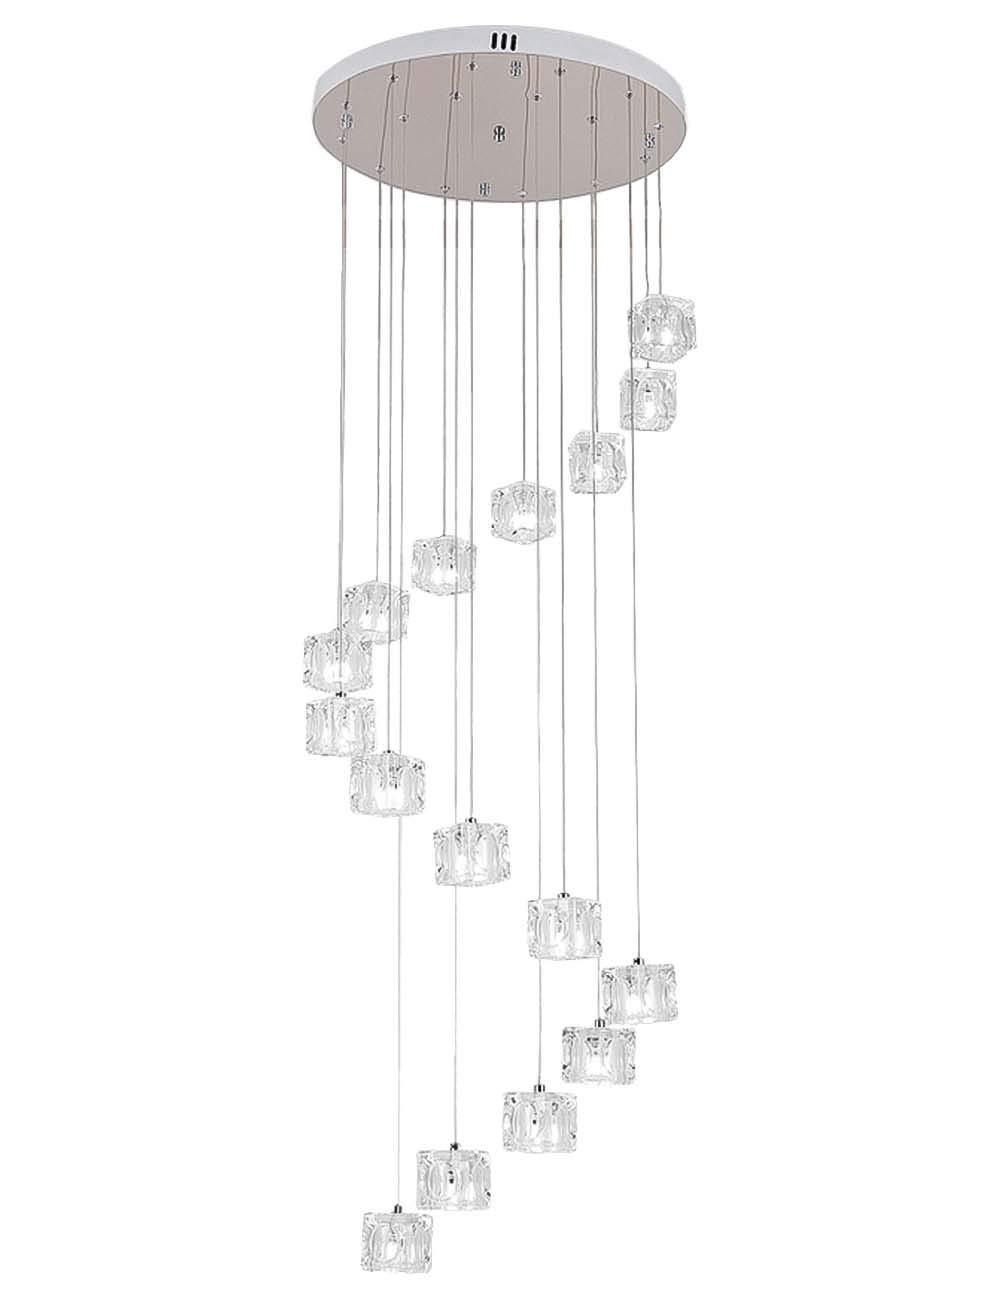 vindeng crystal square chandelier for villa stairs, led g4 16-lights luxury  ceiling light pendant light creative decor adjustable hanging height-cold  white